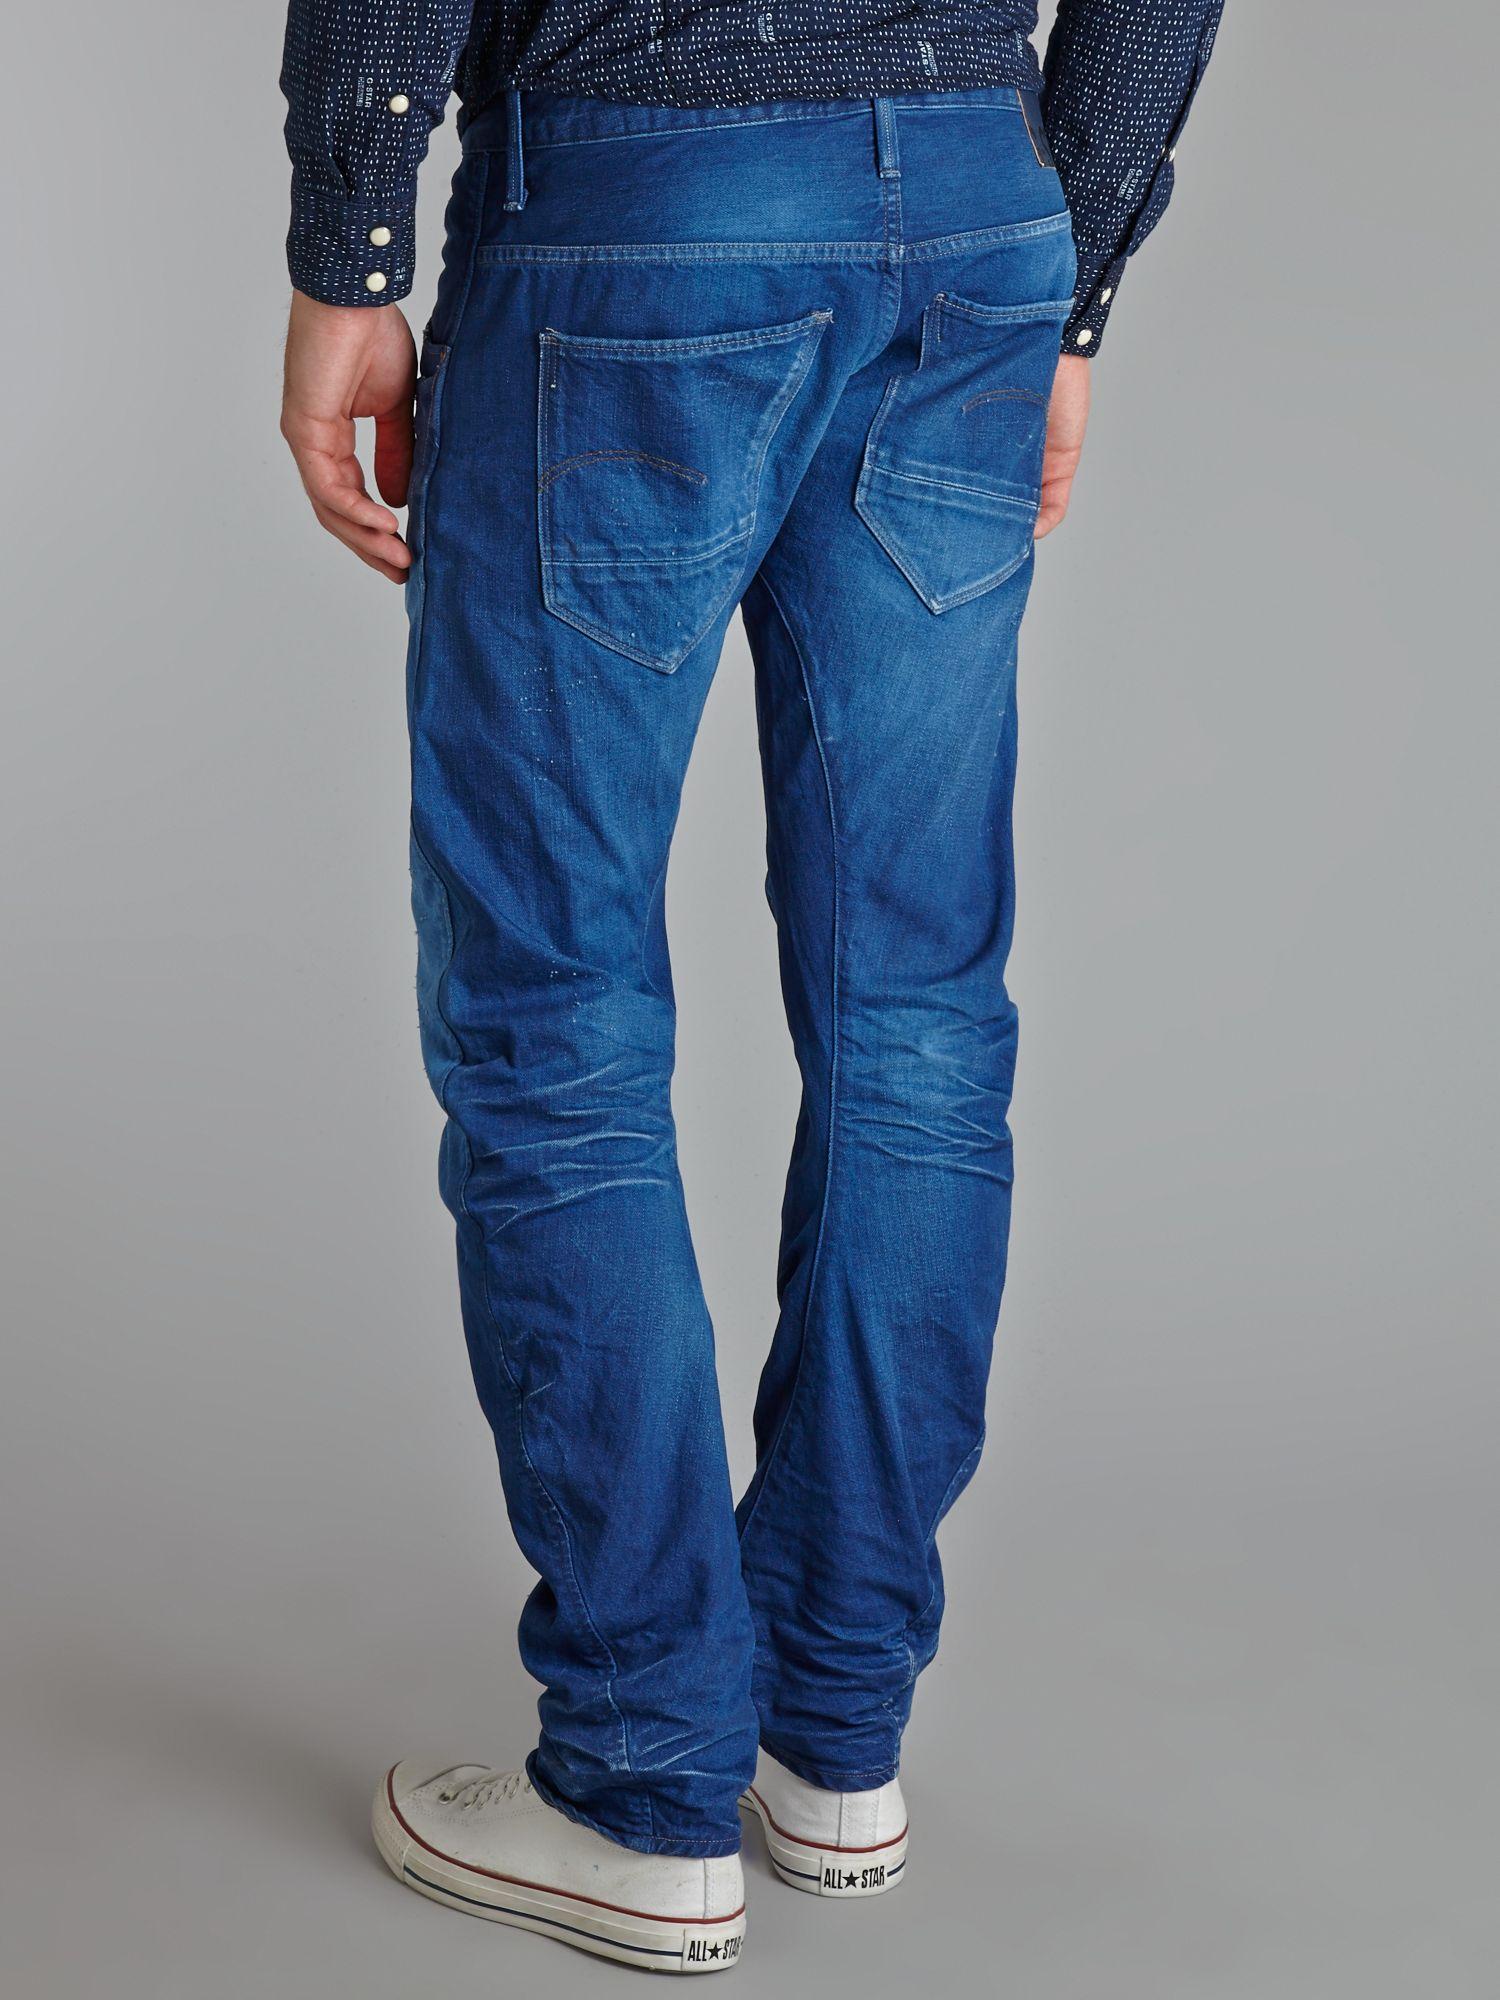 lyst g star raw arc leg slim fit jeans in blue for men. Black Bedroom Furniture Sets. Home Design Ideas